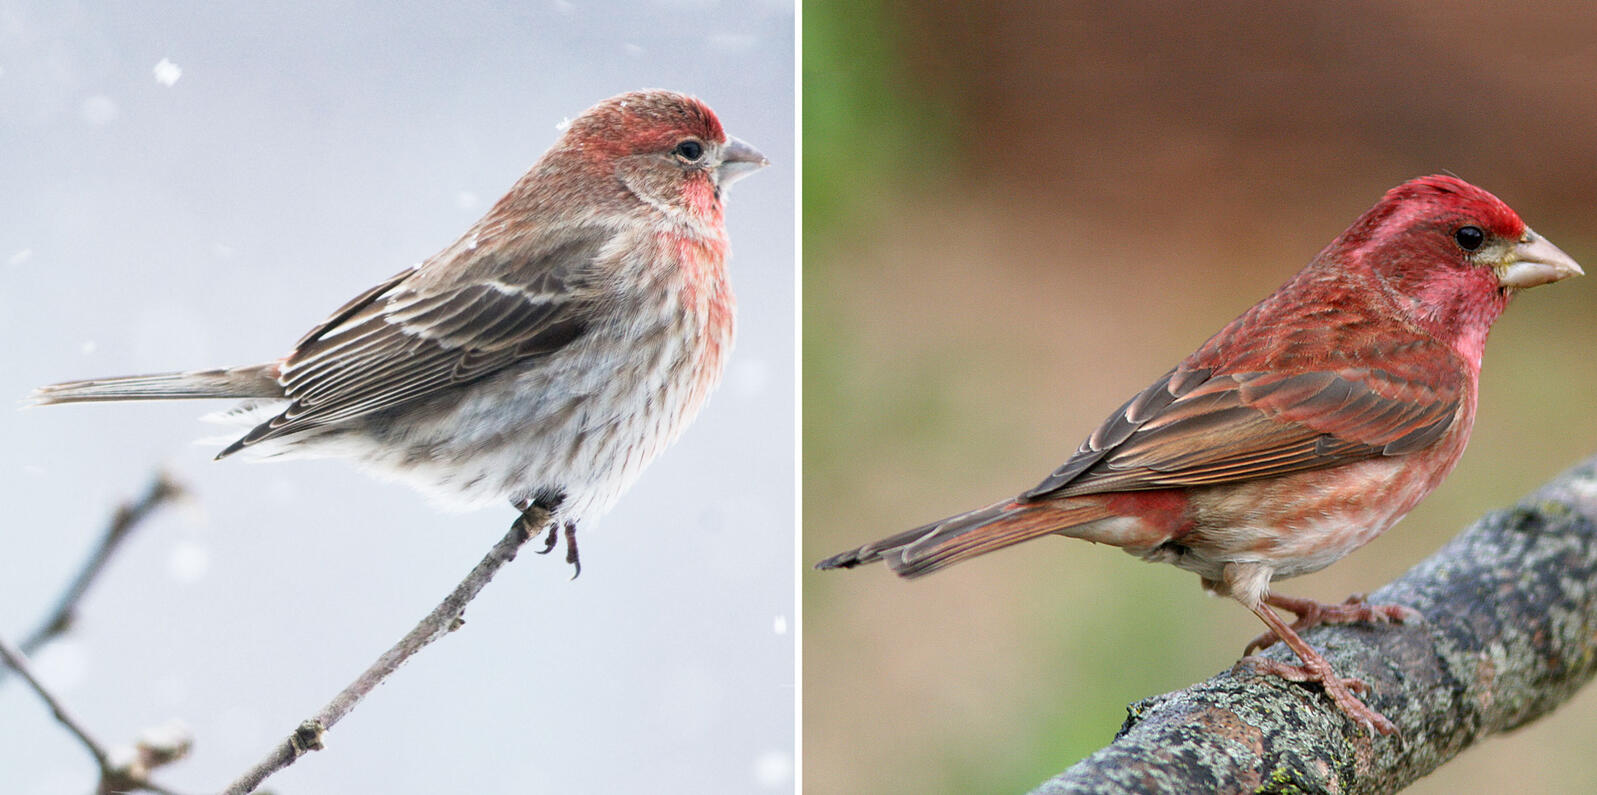 Left: House Finch. Photo: Michele Black/Audubon Photography Awards; Right: Purple Finch. Photo: Alan Schmierer/Flickr (CC0 1.0)